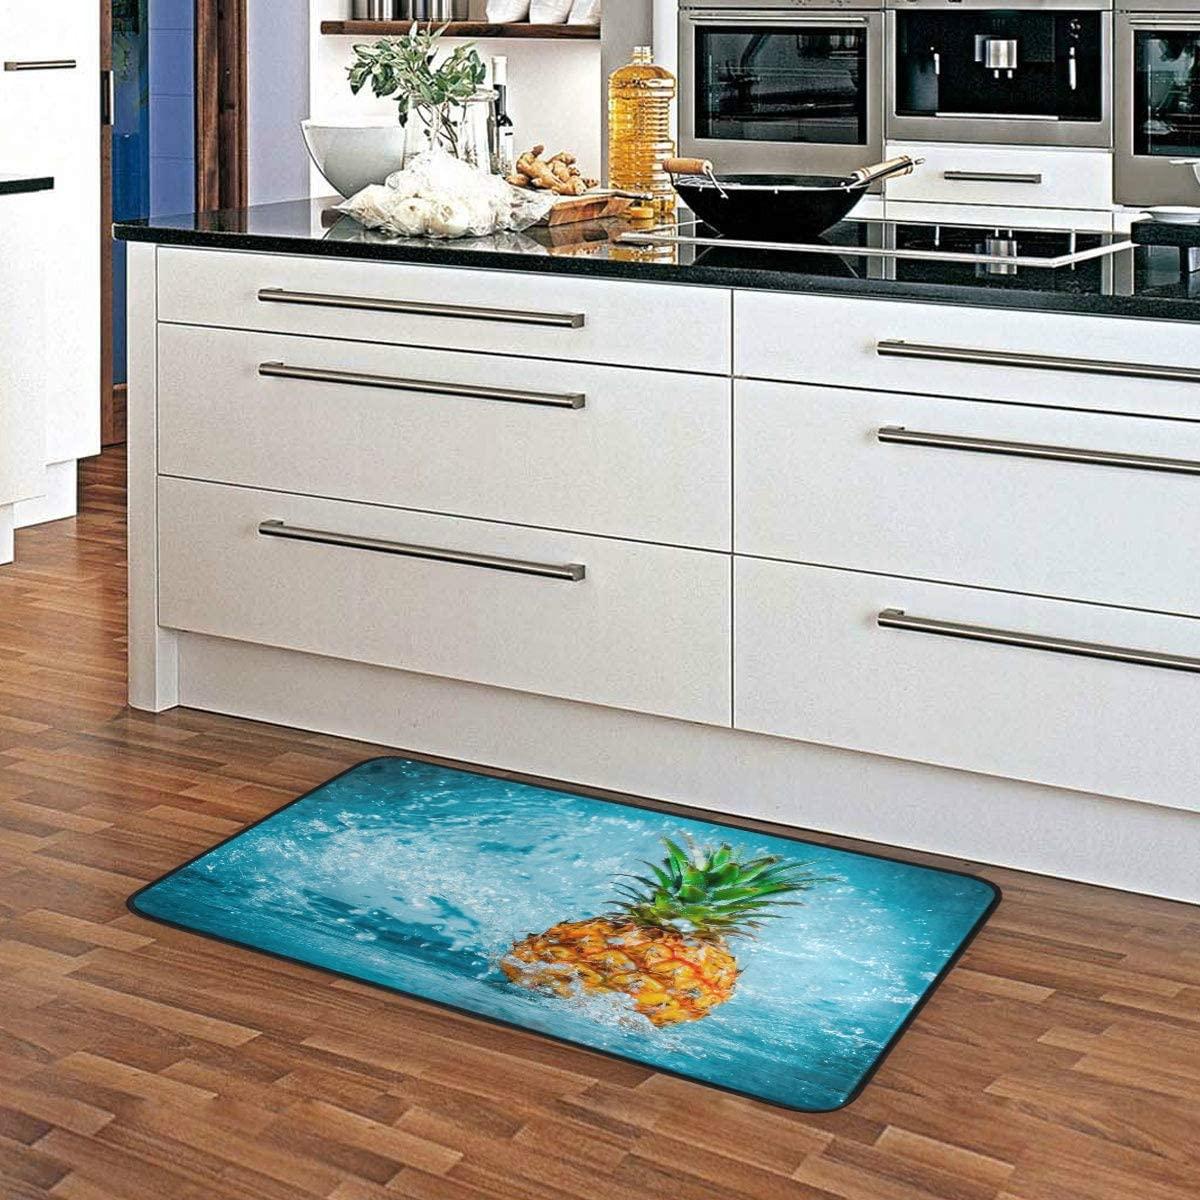 ALAZA Fresh Pineapple Water Non Slip Kitchen Floor Mat Kitchen Rug for Entryway Hallway Bathroom Living Room Bedroom 39 x 20 inches(1.7' x 3.3')